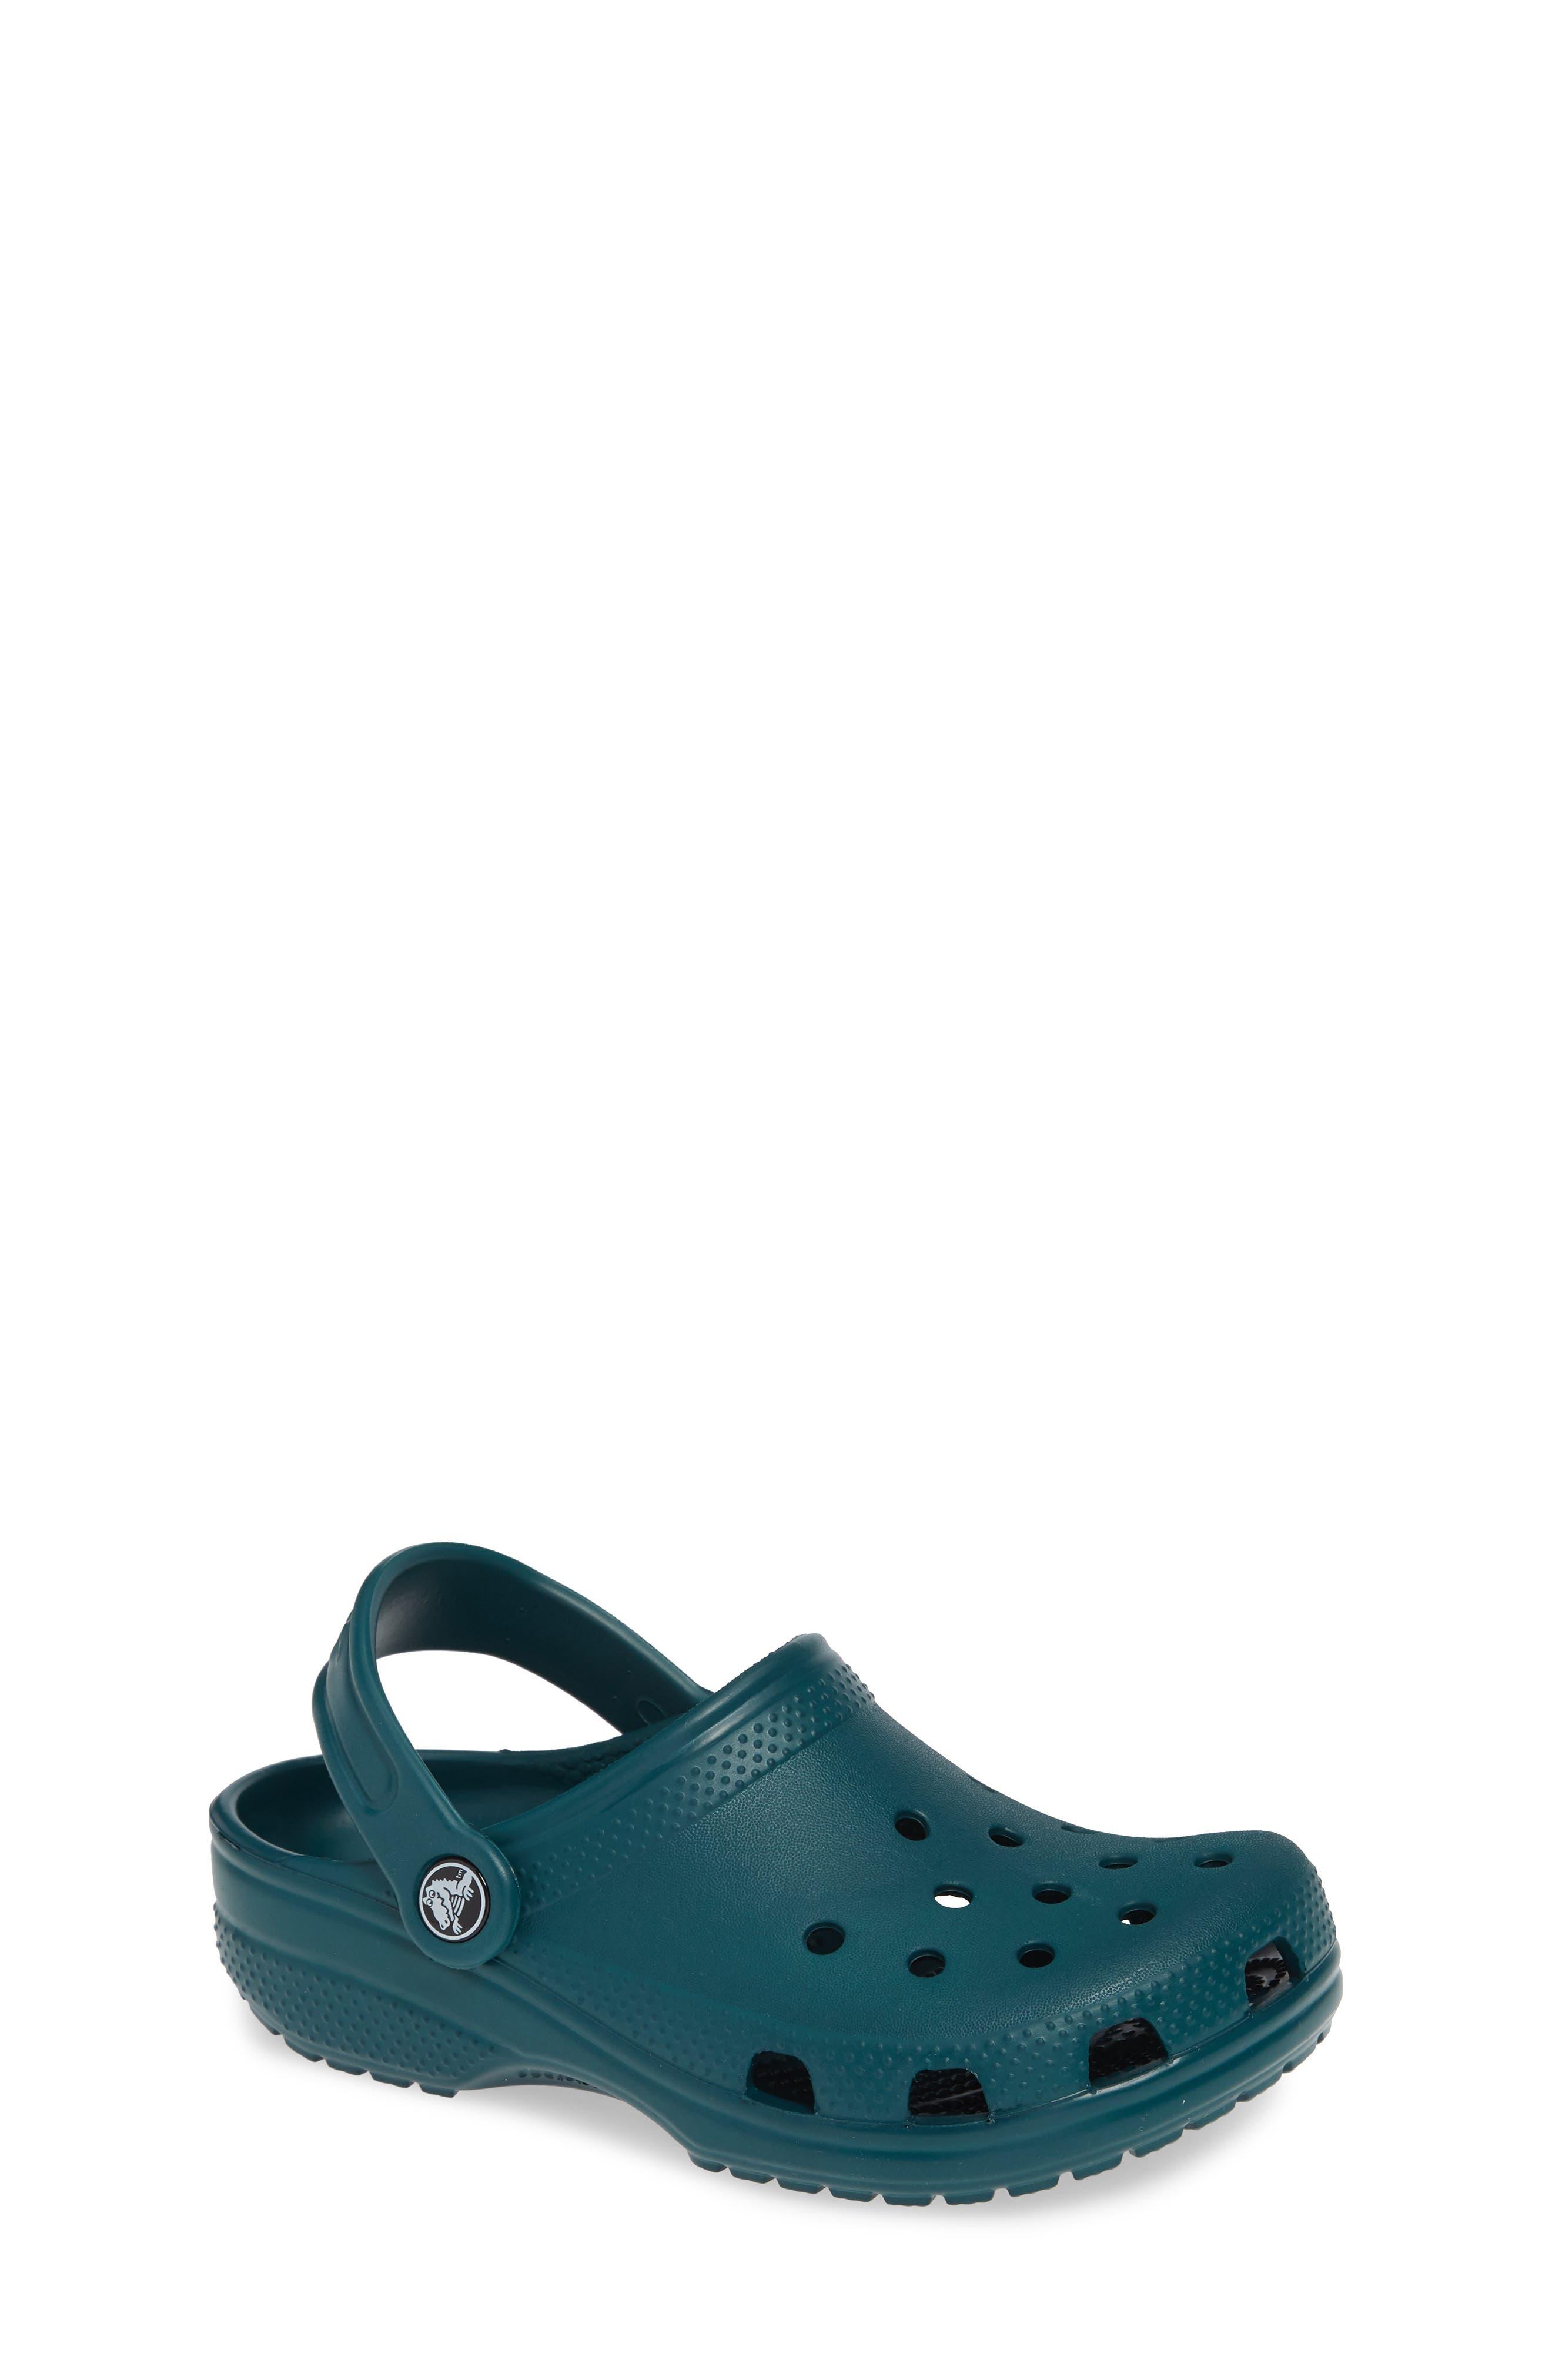 Classic Clog Sandal,                         Main,                         color, EVERGREEN